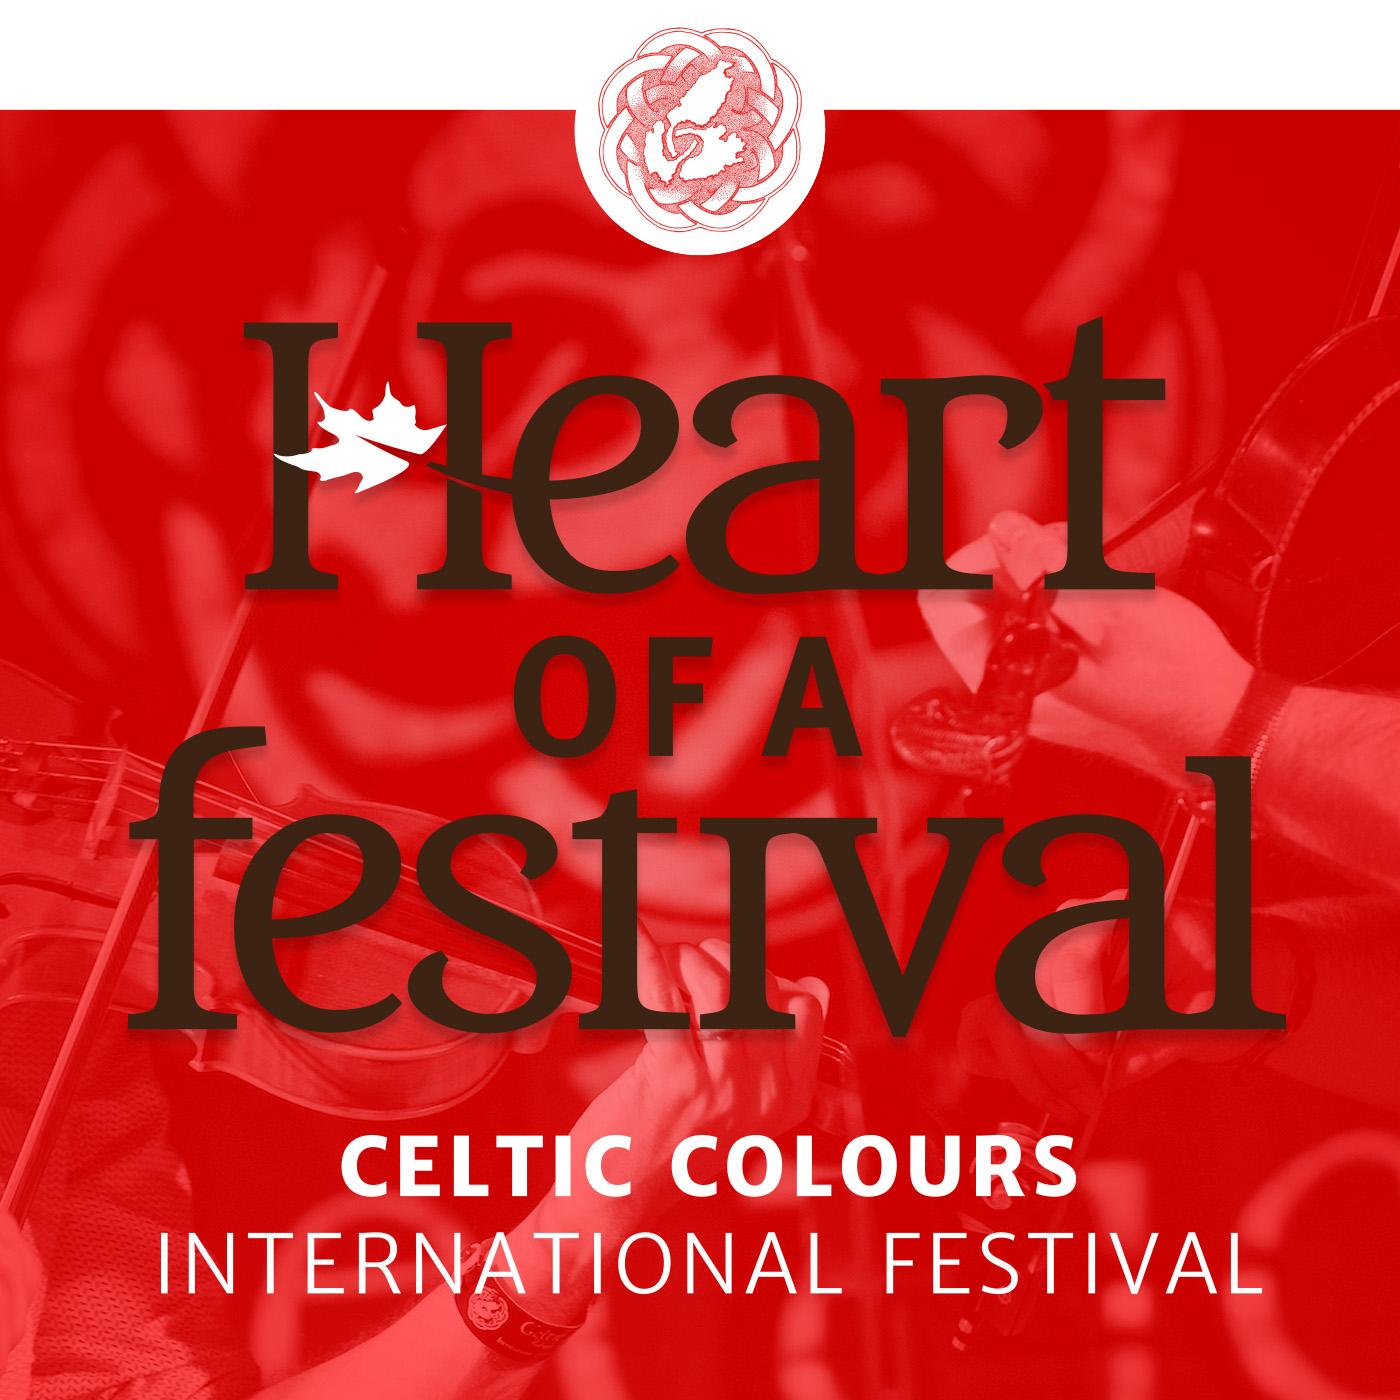 Heart Of A Festival